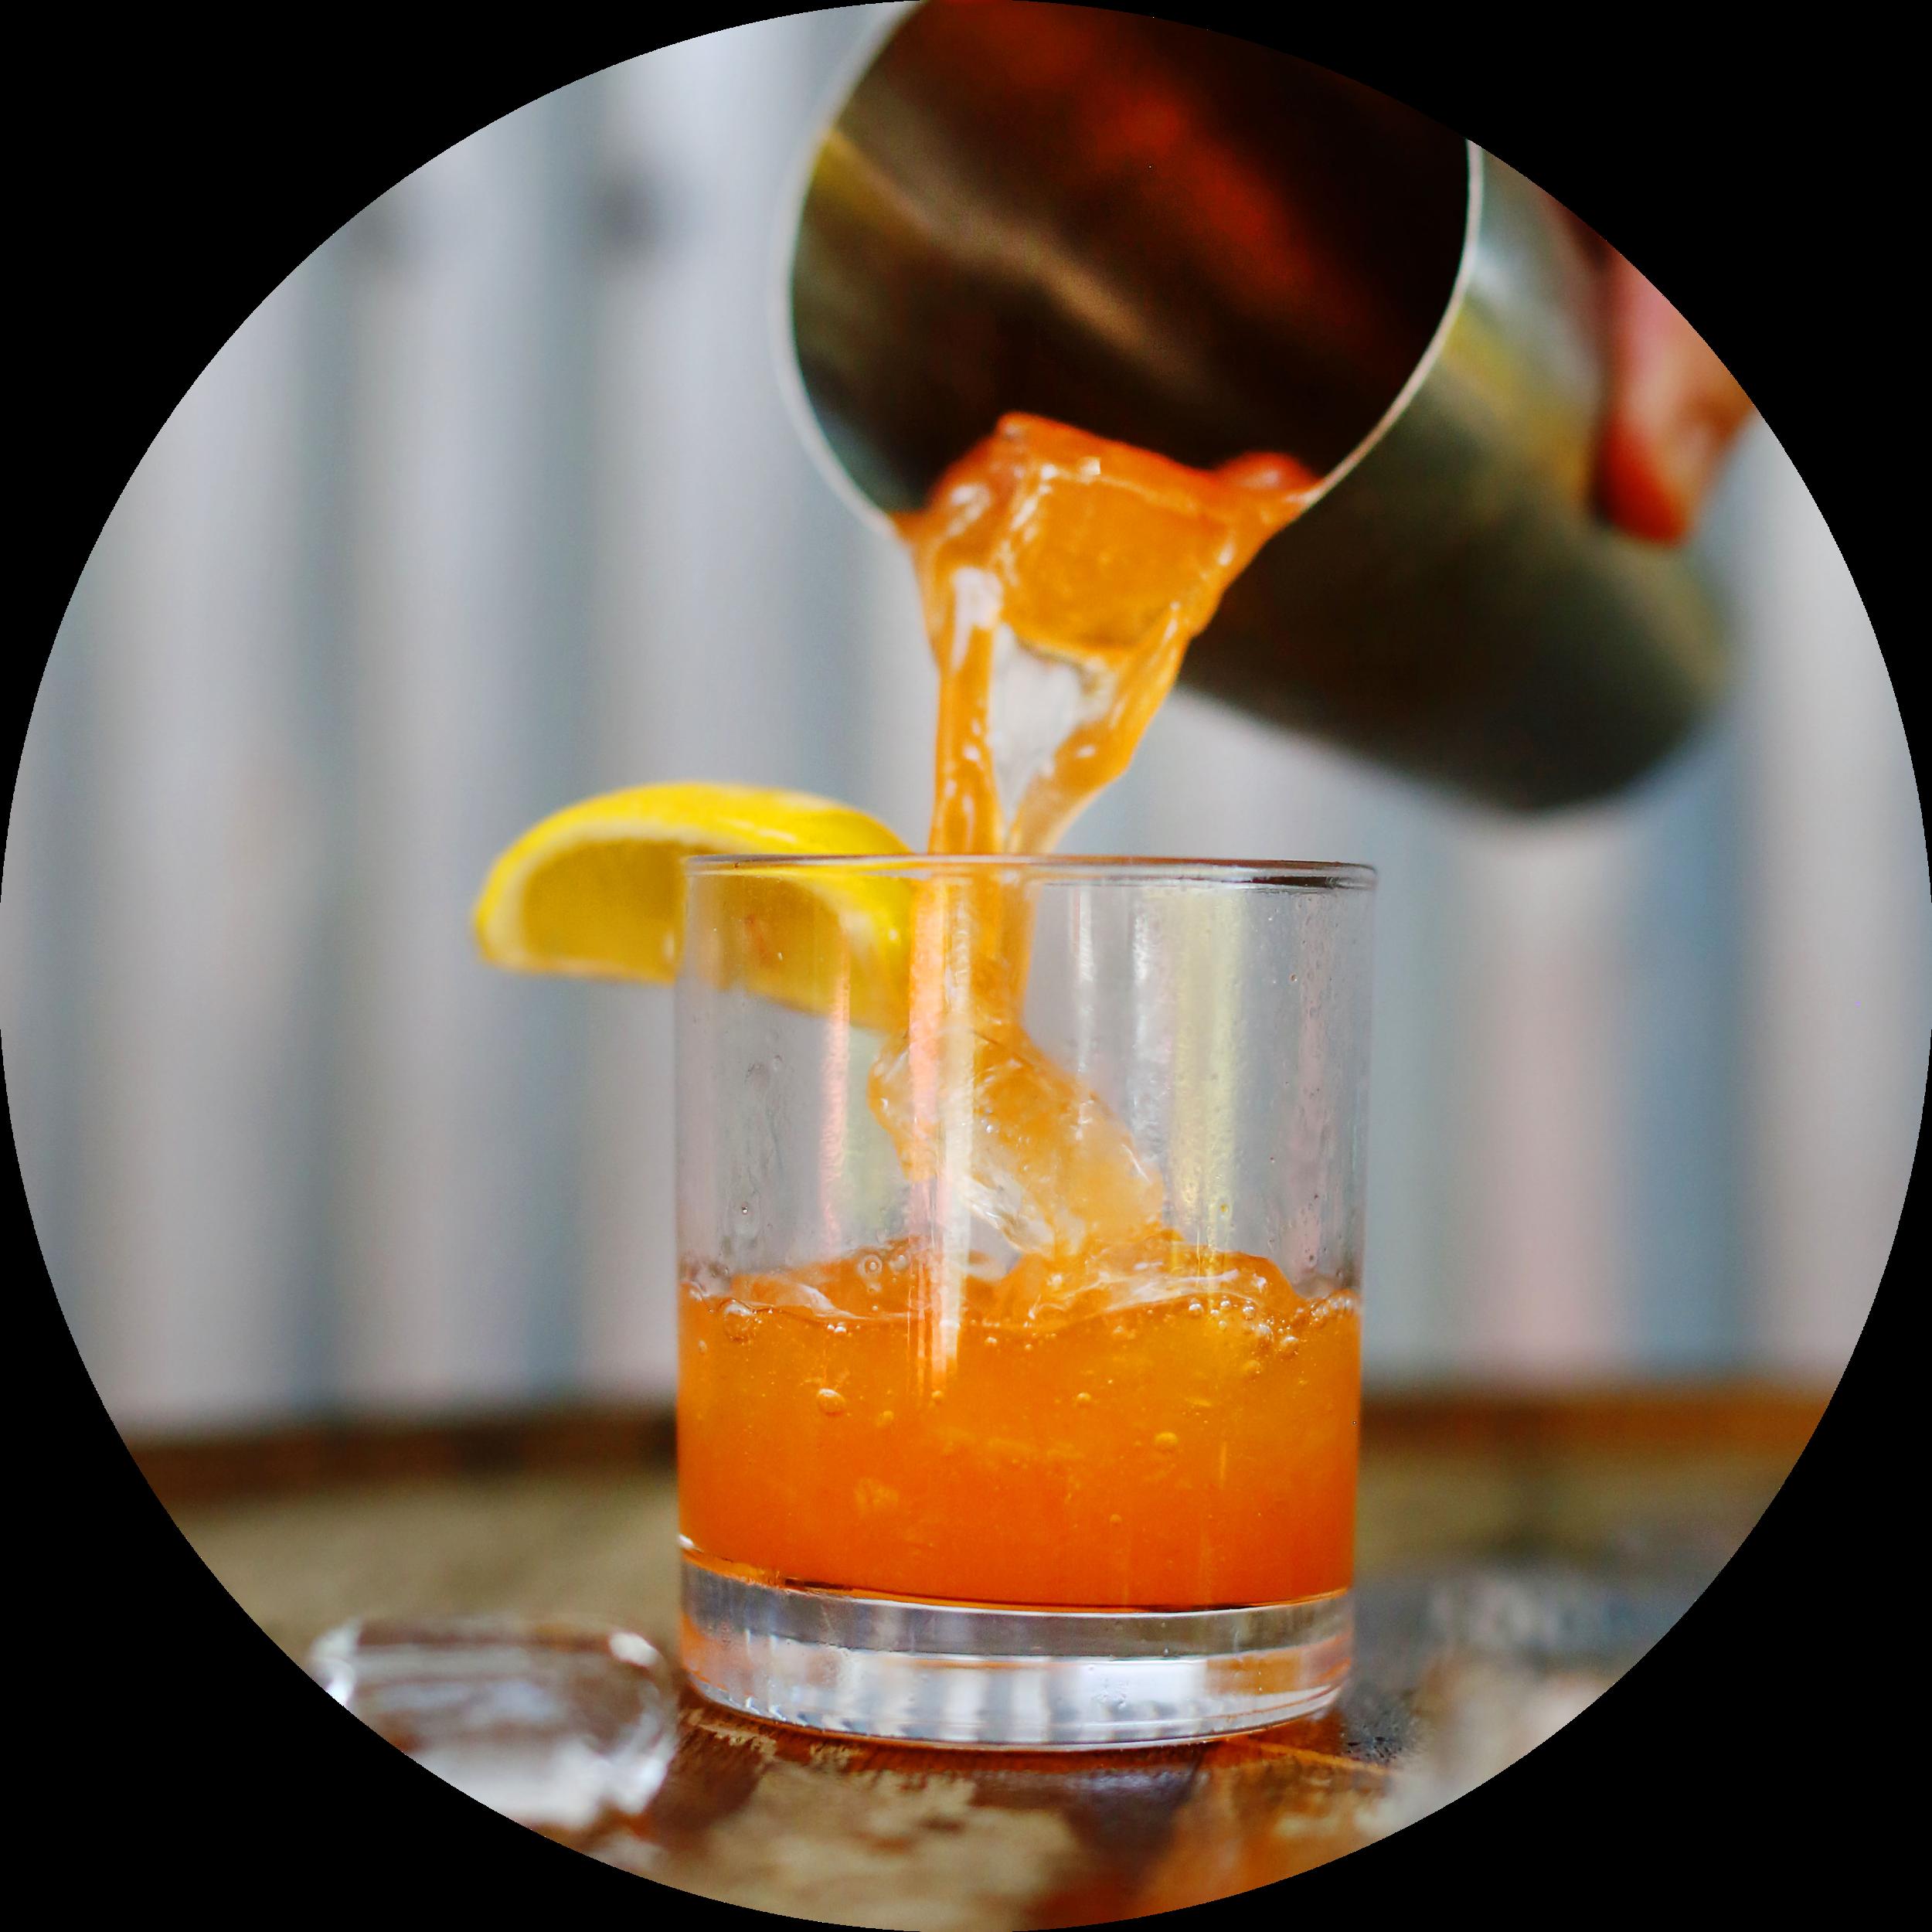 HEMINGWAY DAIQUIRI   2oz Crystal Rum  3/4oz Fresh lime Juice  1/2oz Fresh Grapefruit Juice  1/2oz Maraschino Liquor    Shaken, Served Up